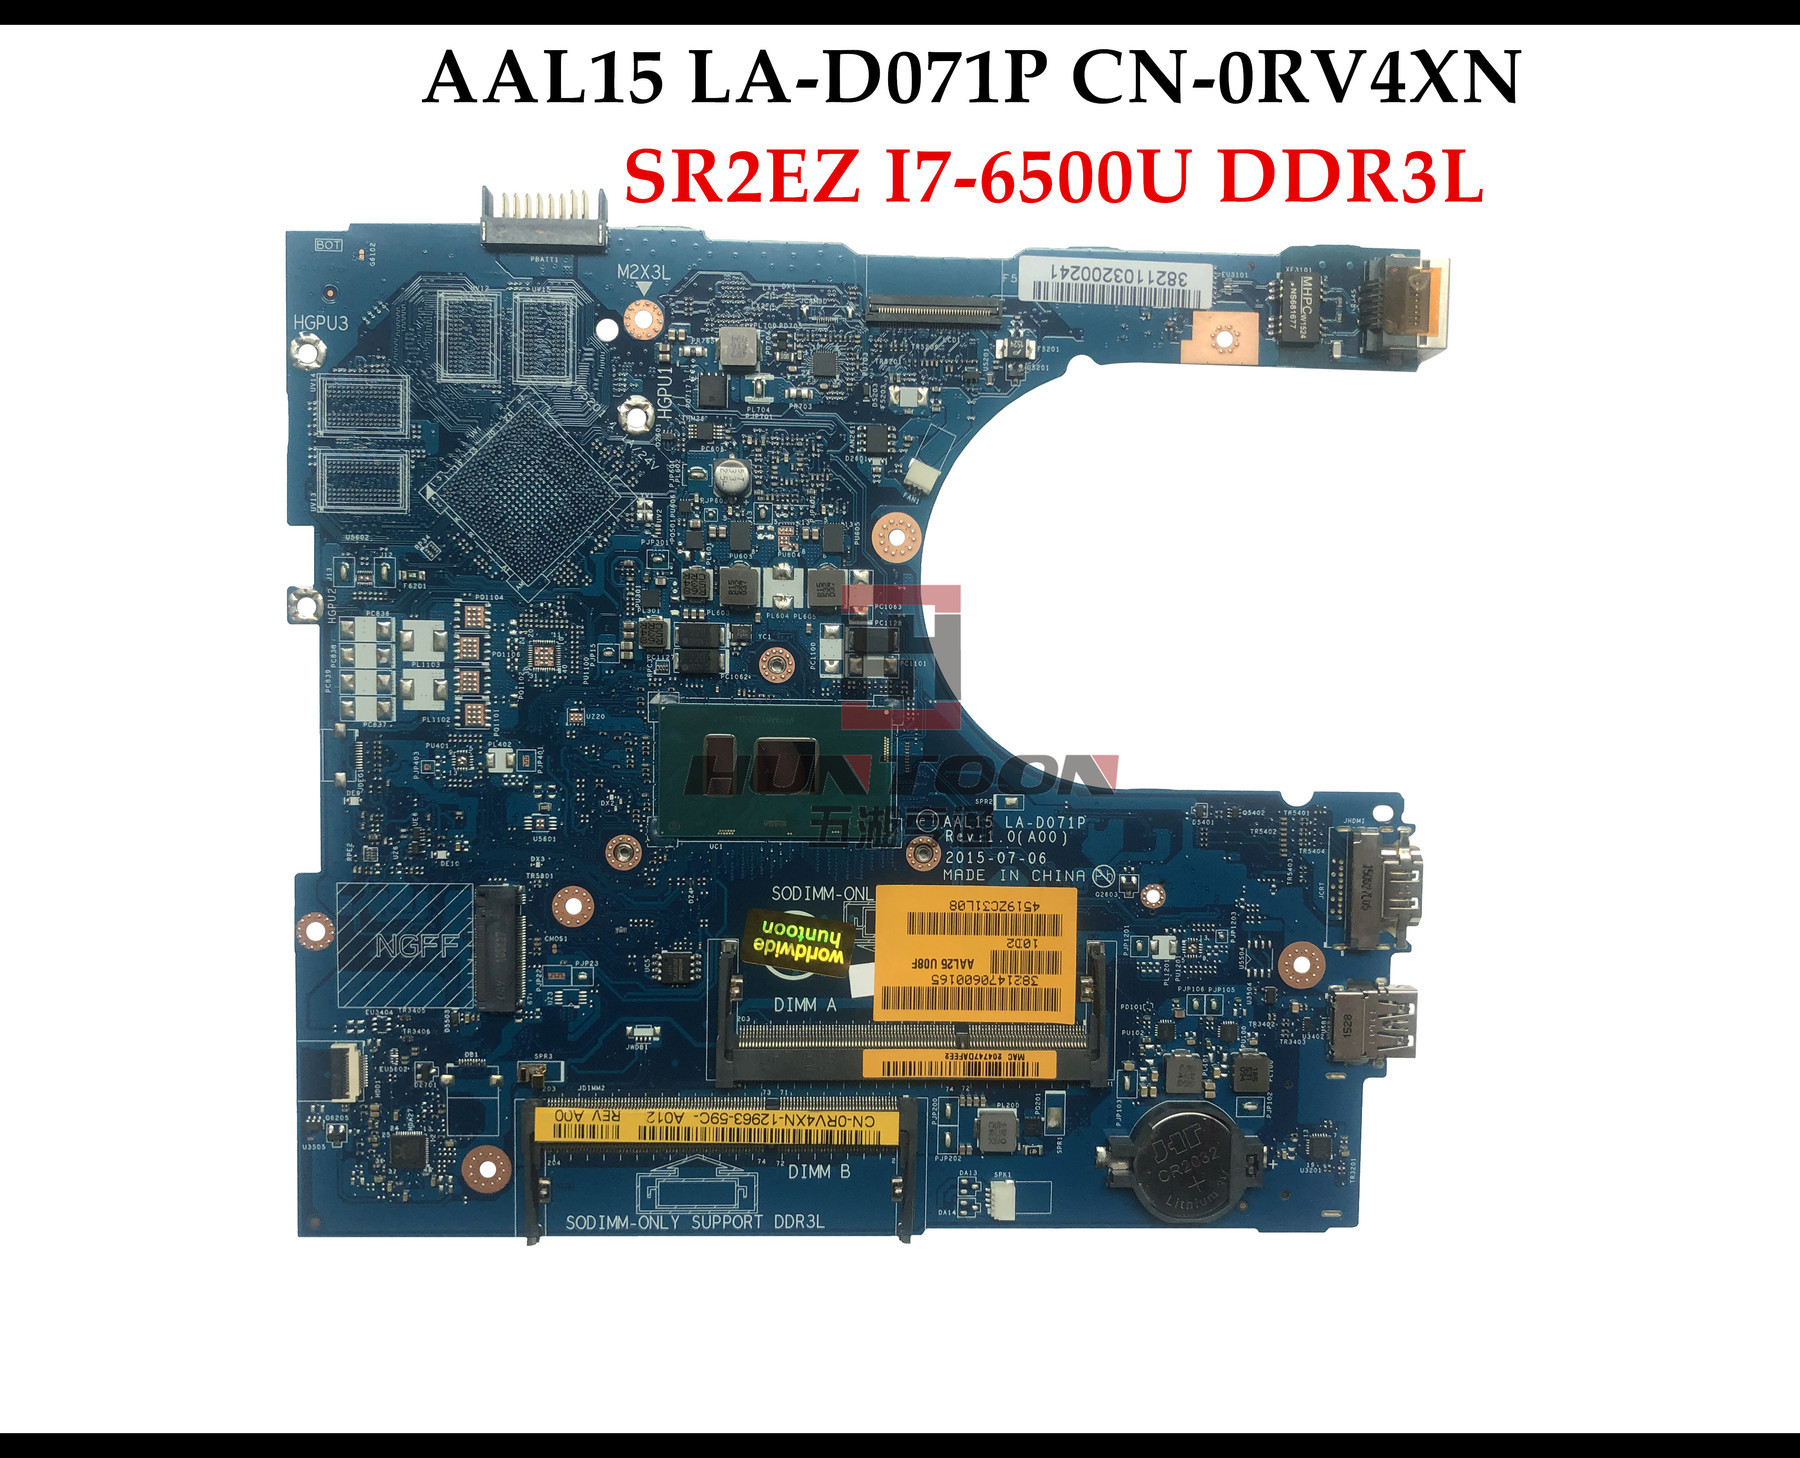 NEW GENUINE Dell Inspiron 5559 Laptop Motherboard Intel i7-6500U LA-D071P RV4XN